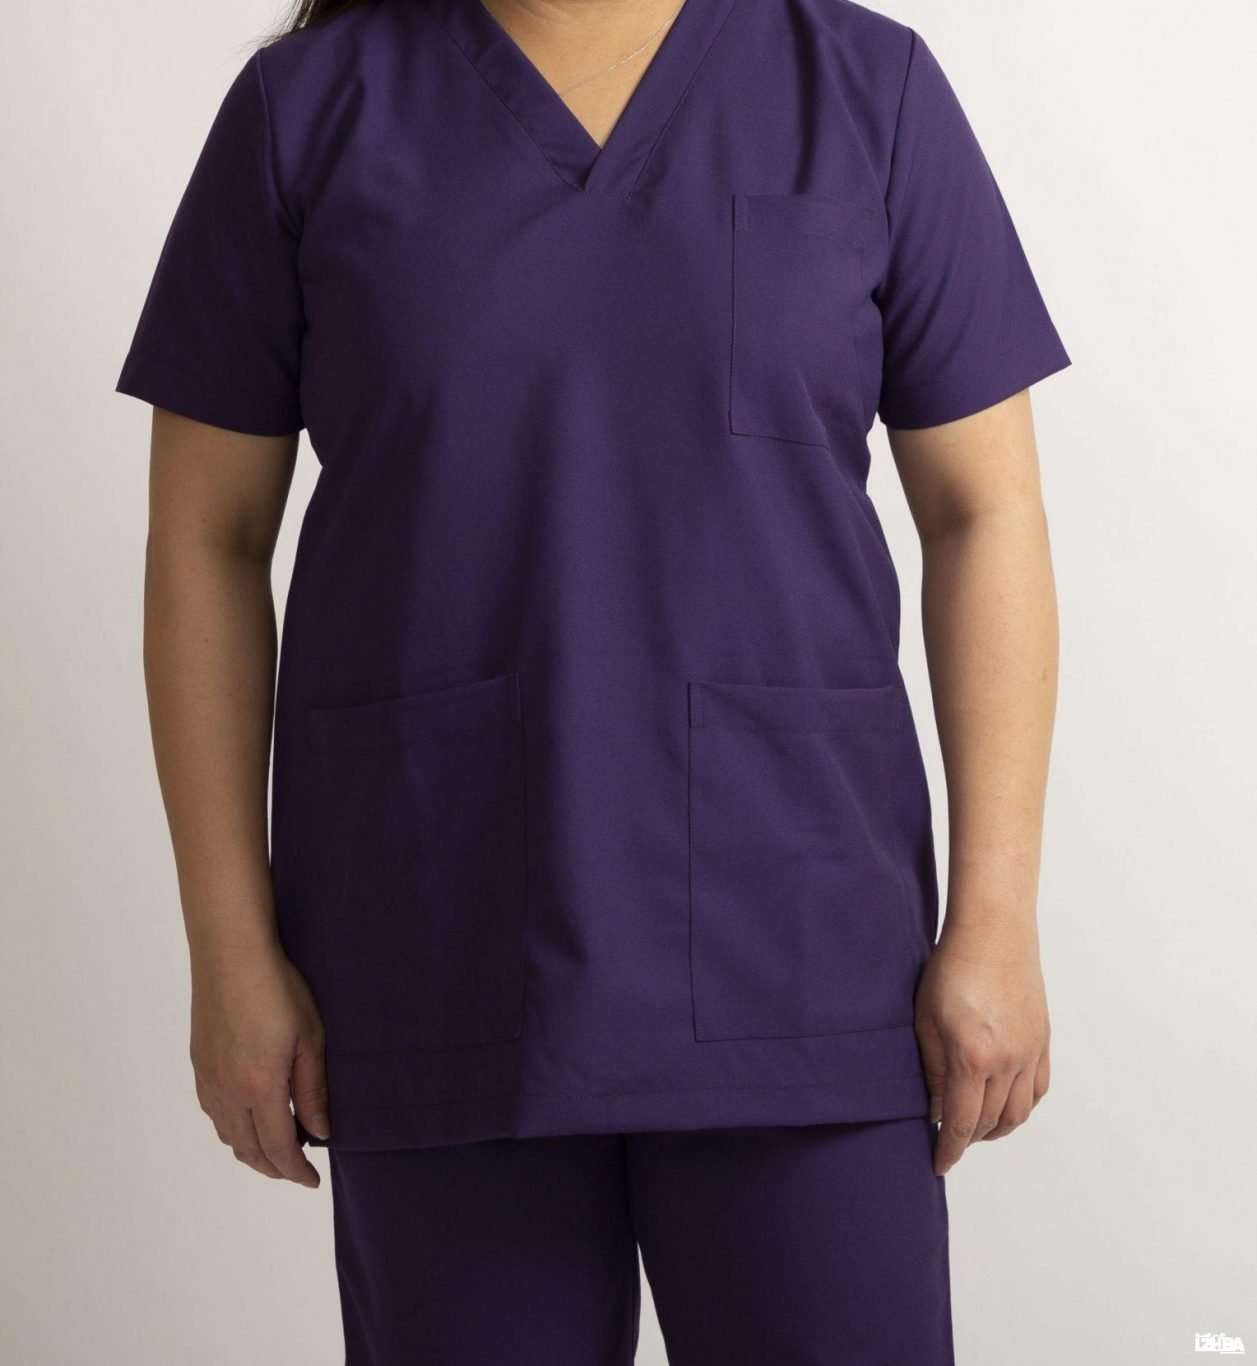 Scrub Suit – Purple color